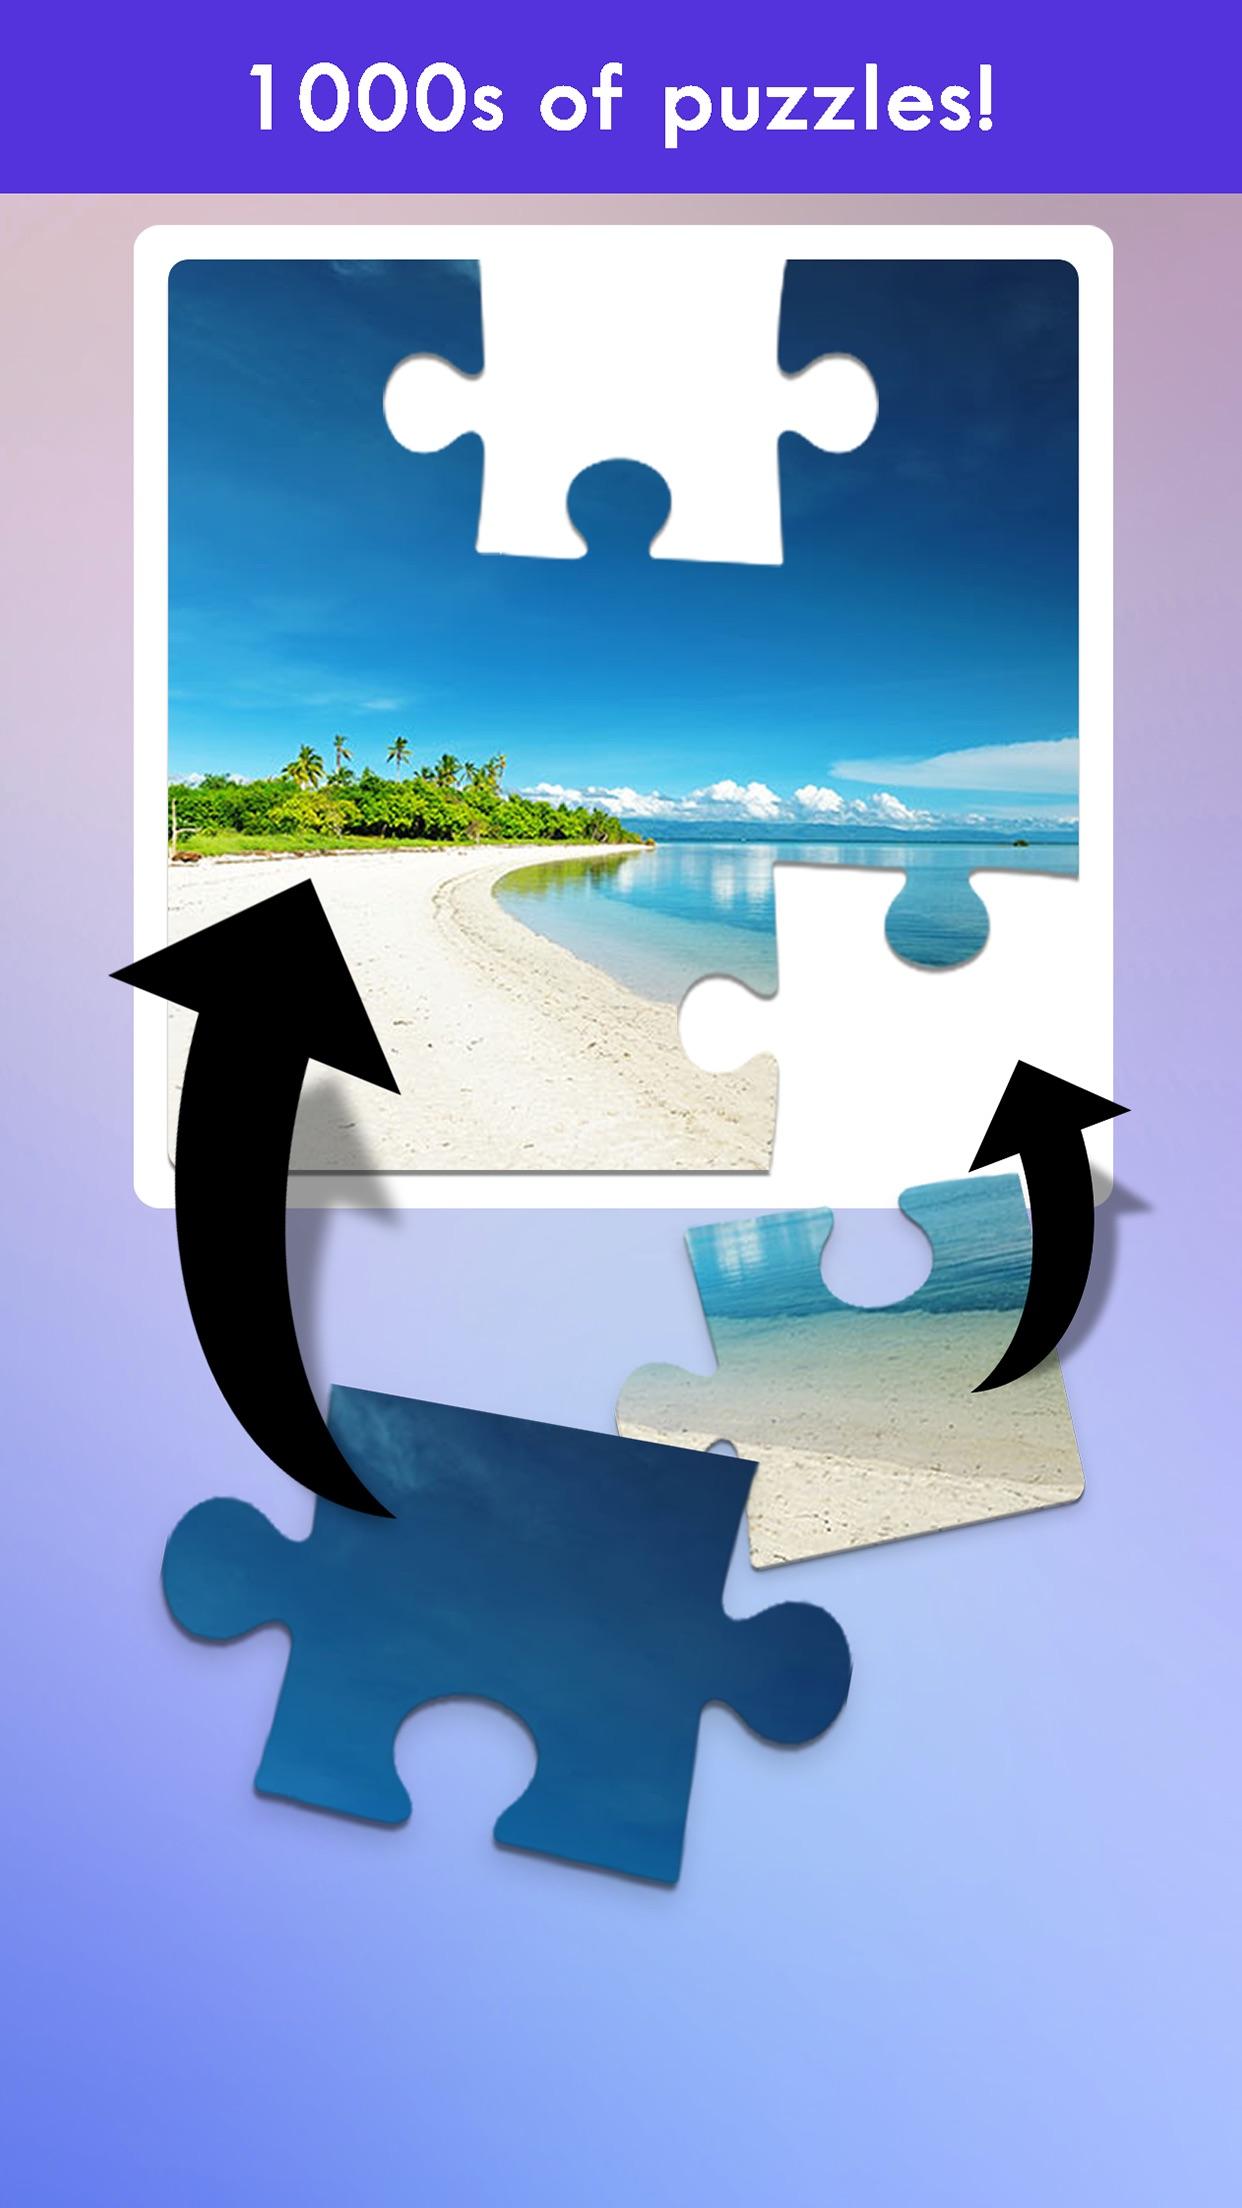 100 PICS Puzzles - jigsaw puzzle games Screenshot